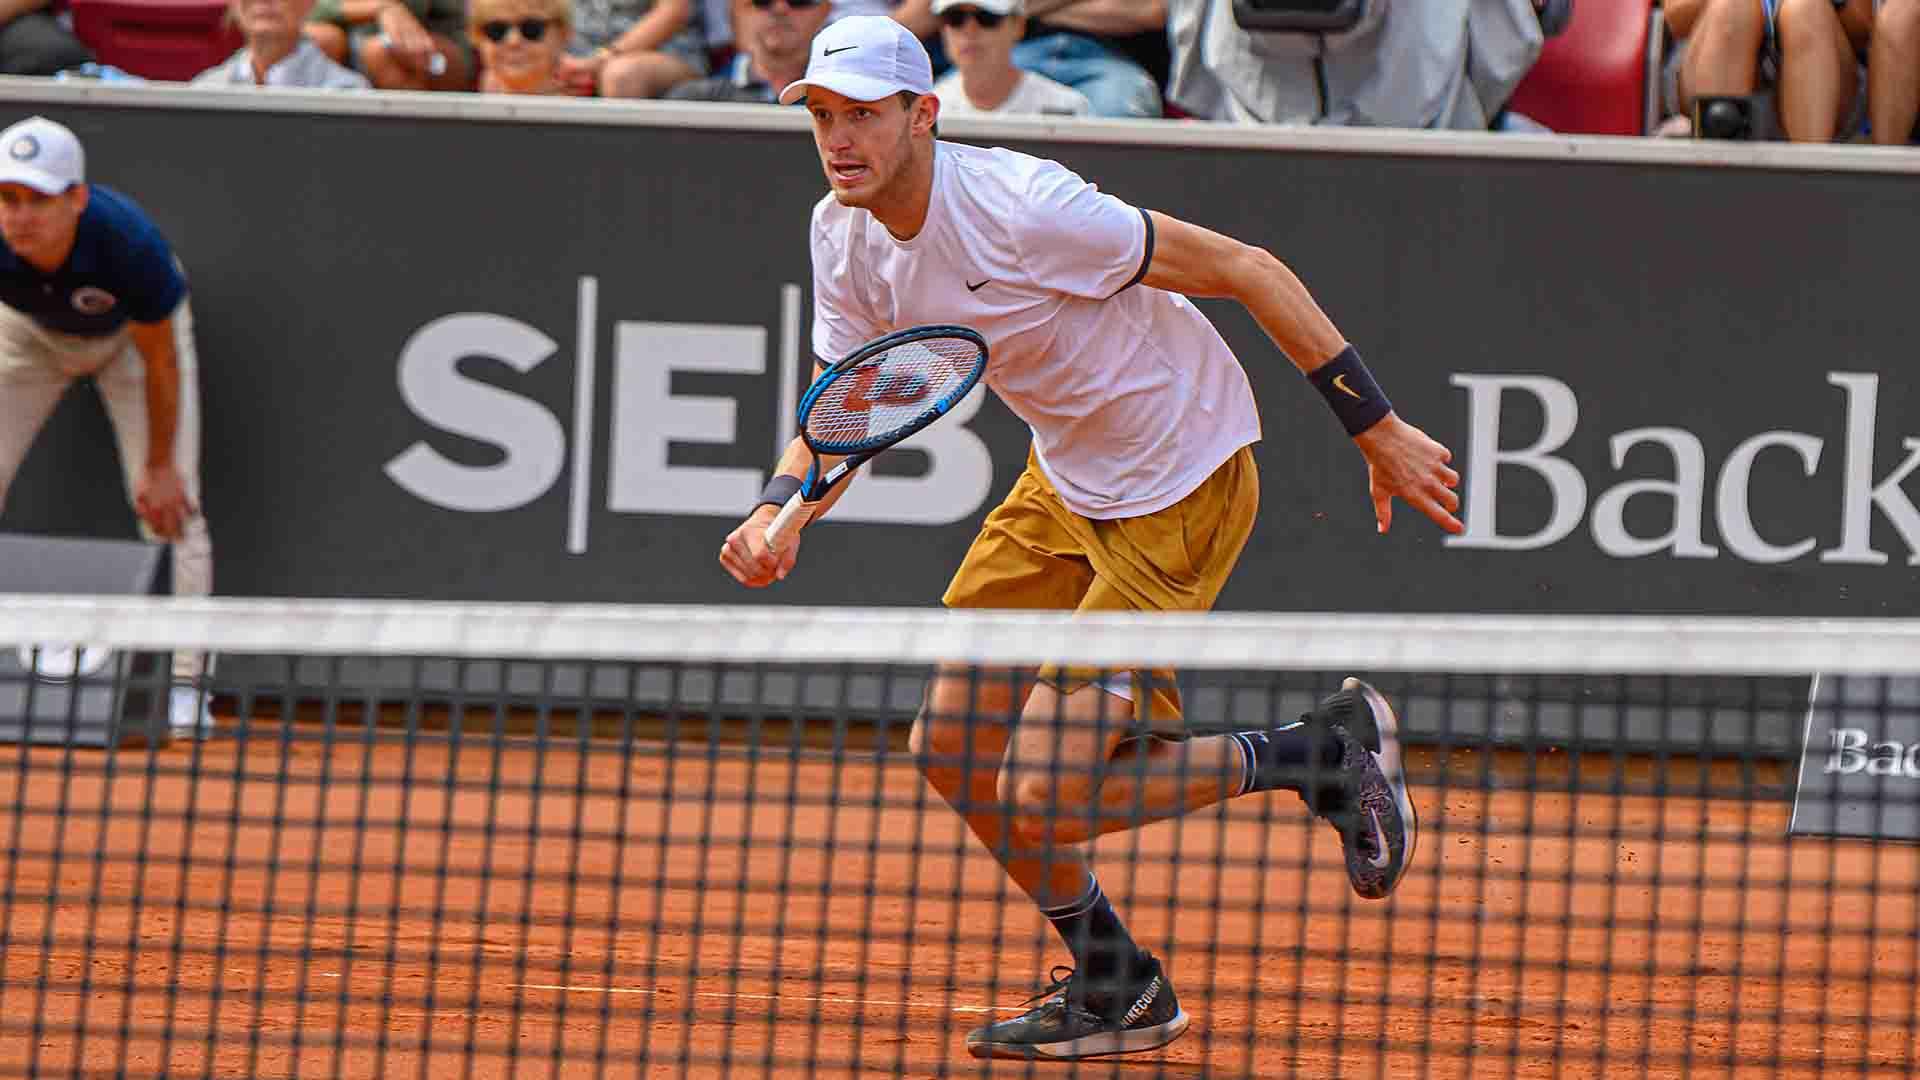 Nicolas Jarry converts two of two break points to beat Juan Ignacio Londero in the Swedish Open final on Sunday.